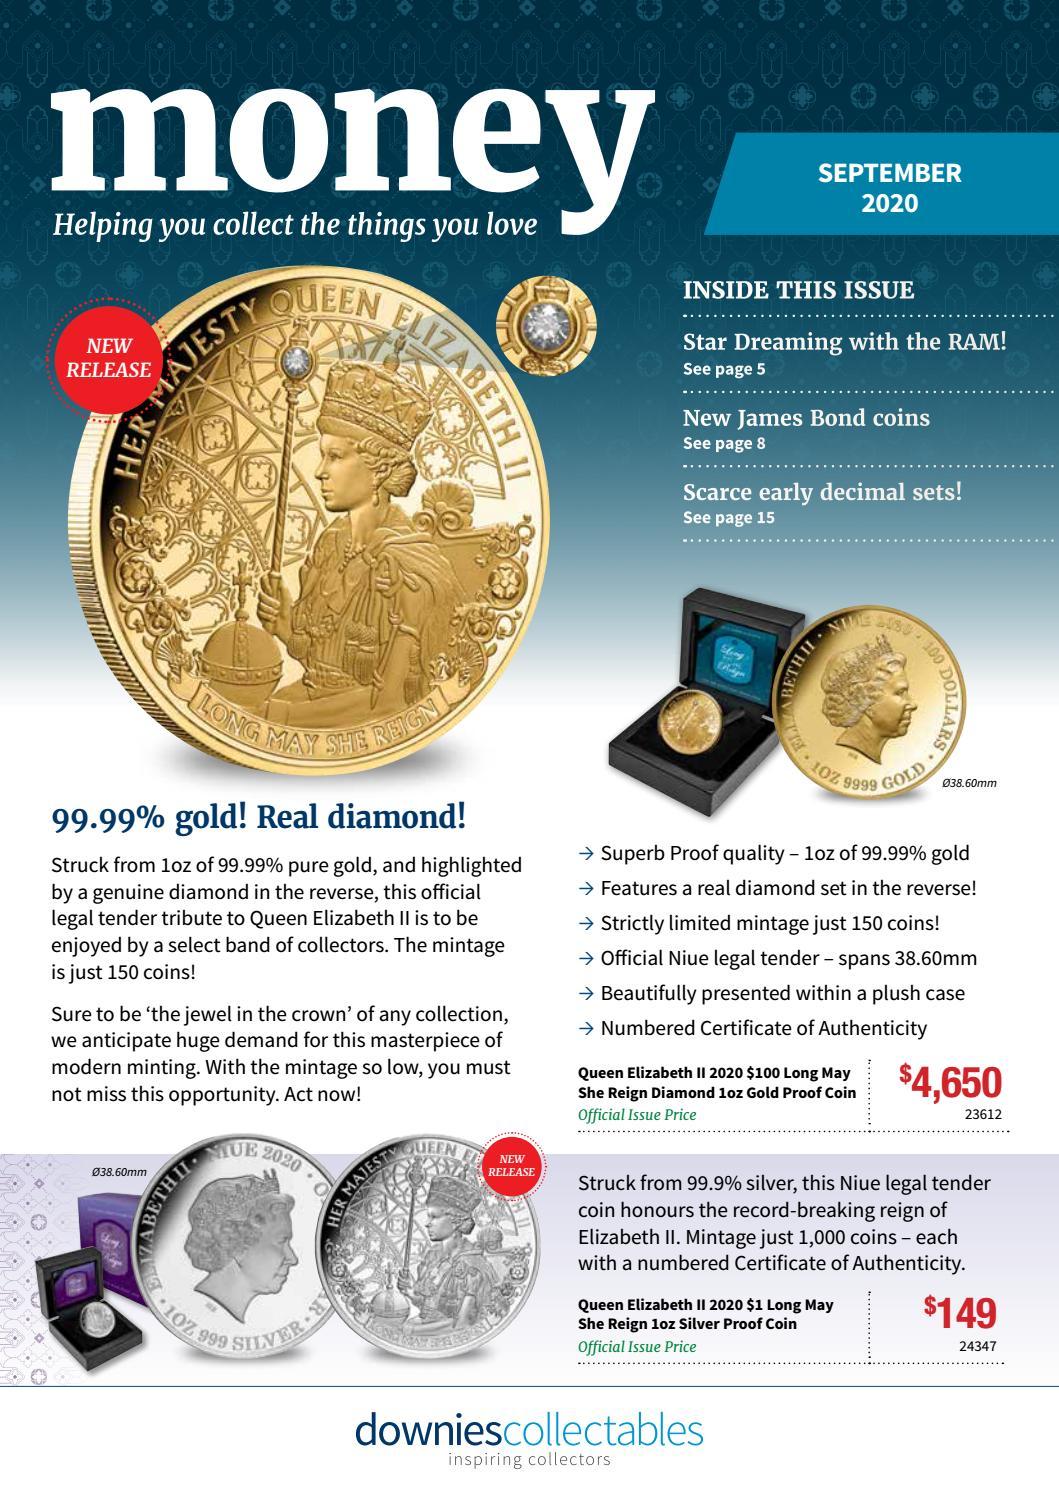 AUSTRALIA WORLD WAR II PROOF COIN 2015 $1 NIUE